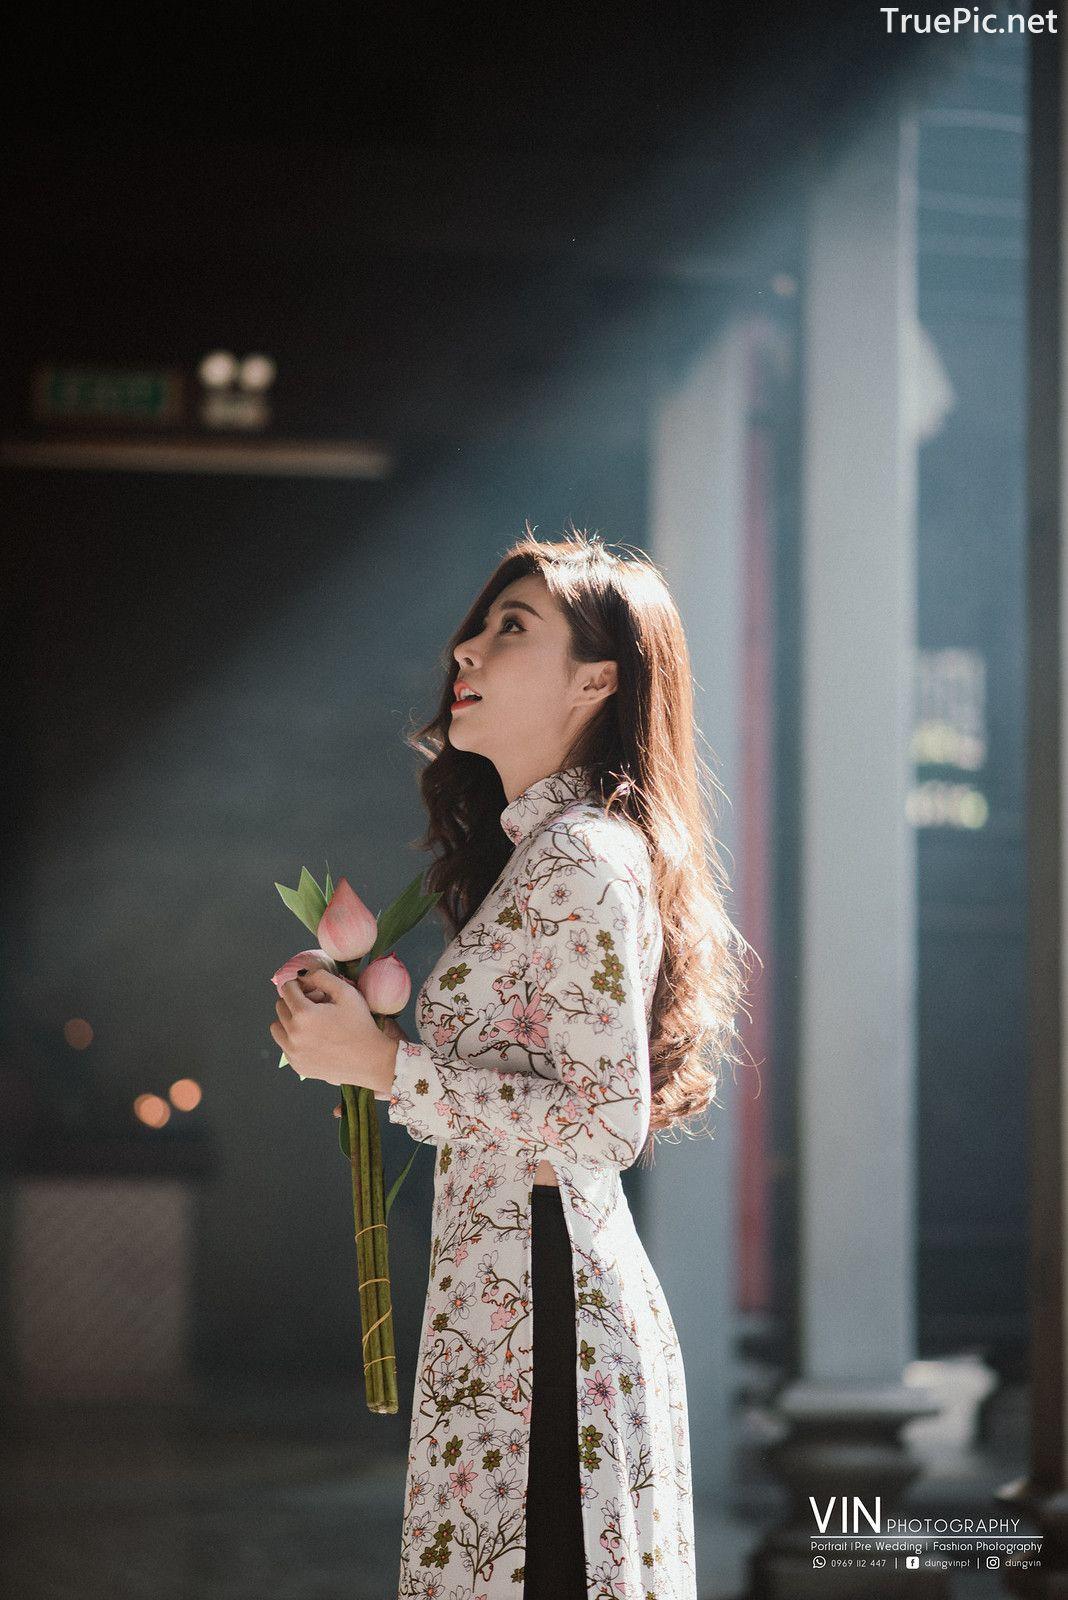 Image-Vietnamese-Beautiful-Girl-Ao-Dai-Vietnam-Traditional-Dress-by-VIN-Photo-3-TruePic.net- Picture-1